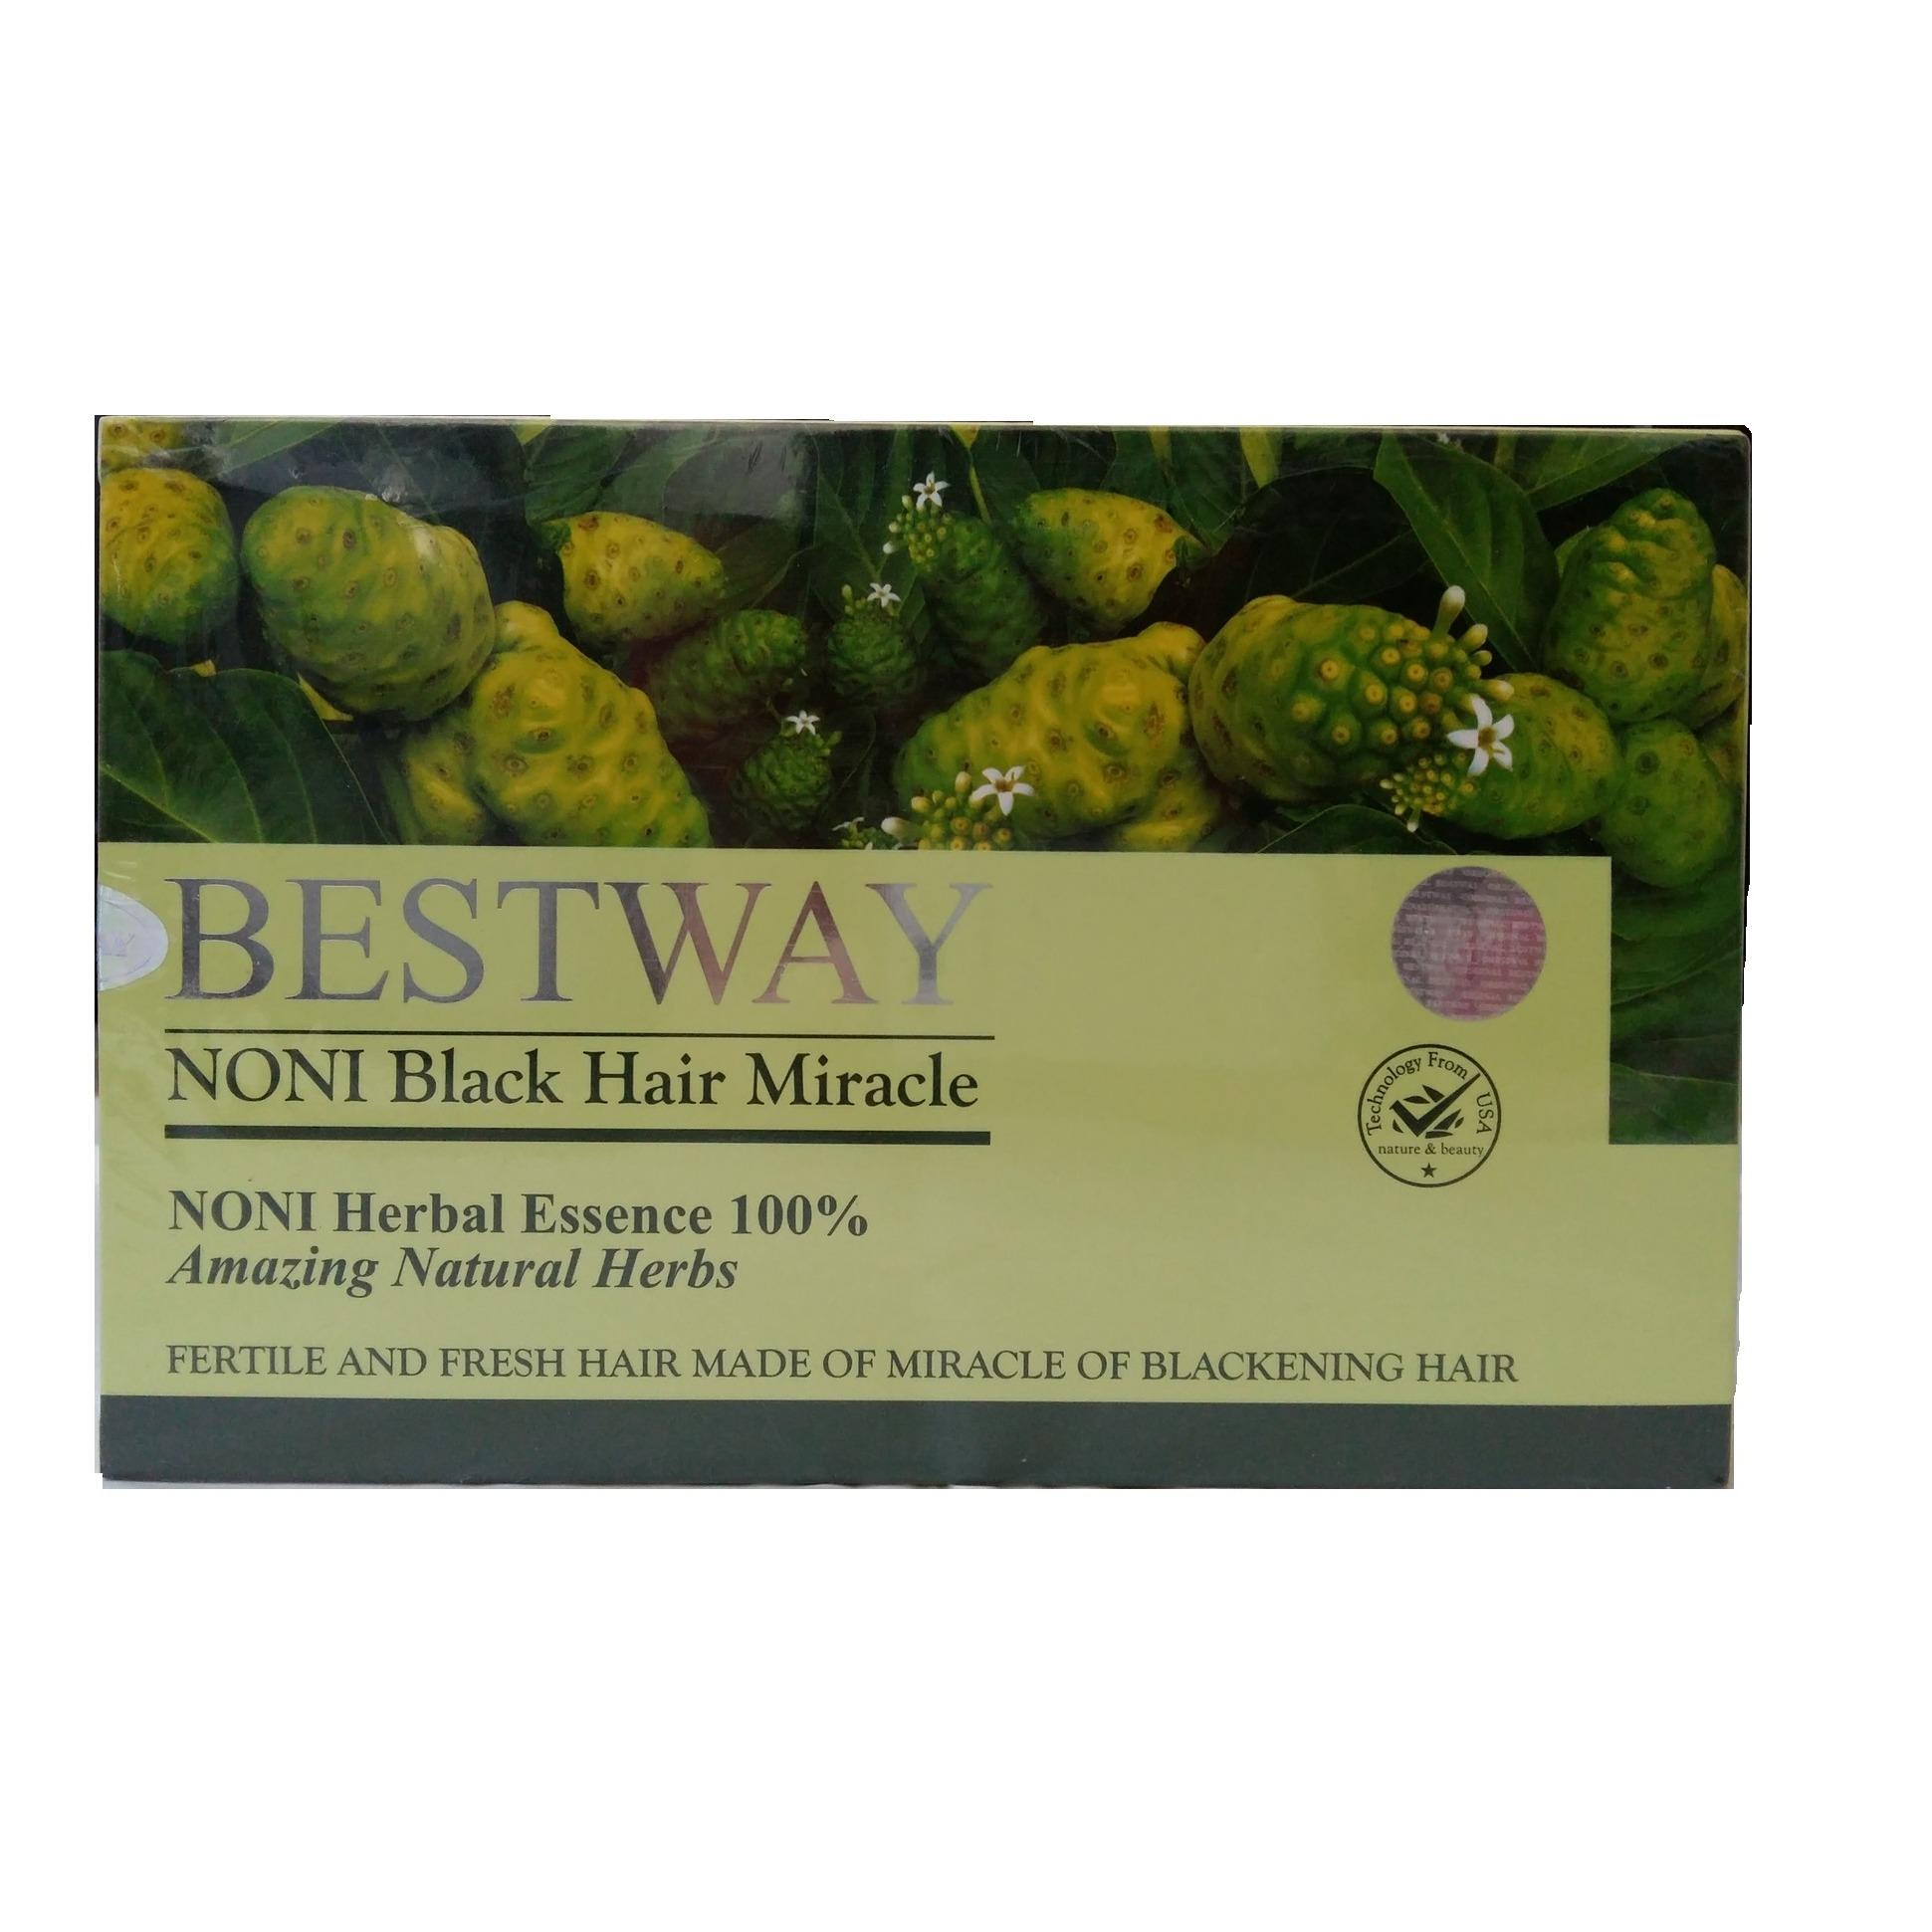 Shampoo Bestway NONI Black Hair Miracle 100% Herbal Essence - 1 Box